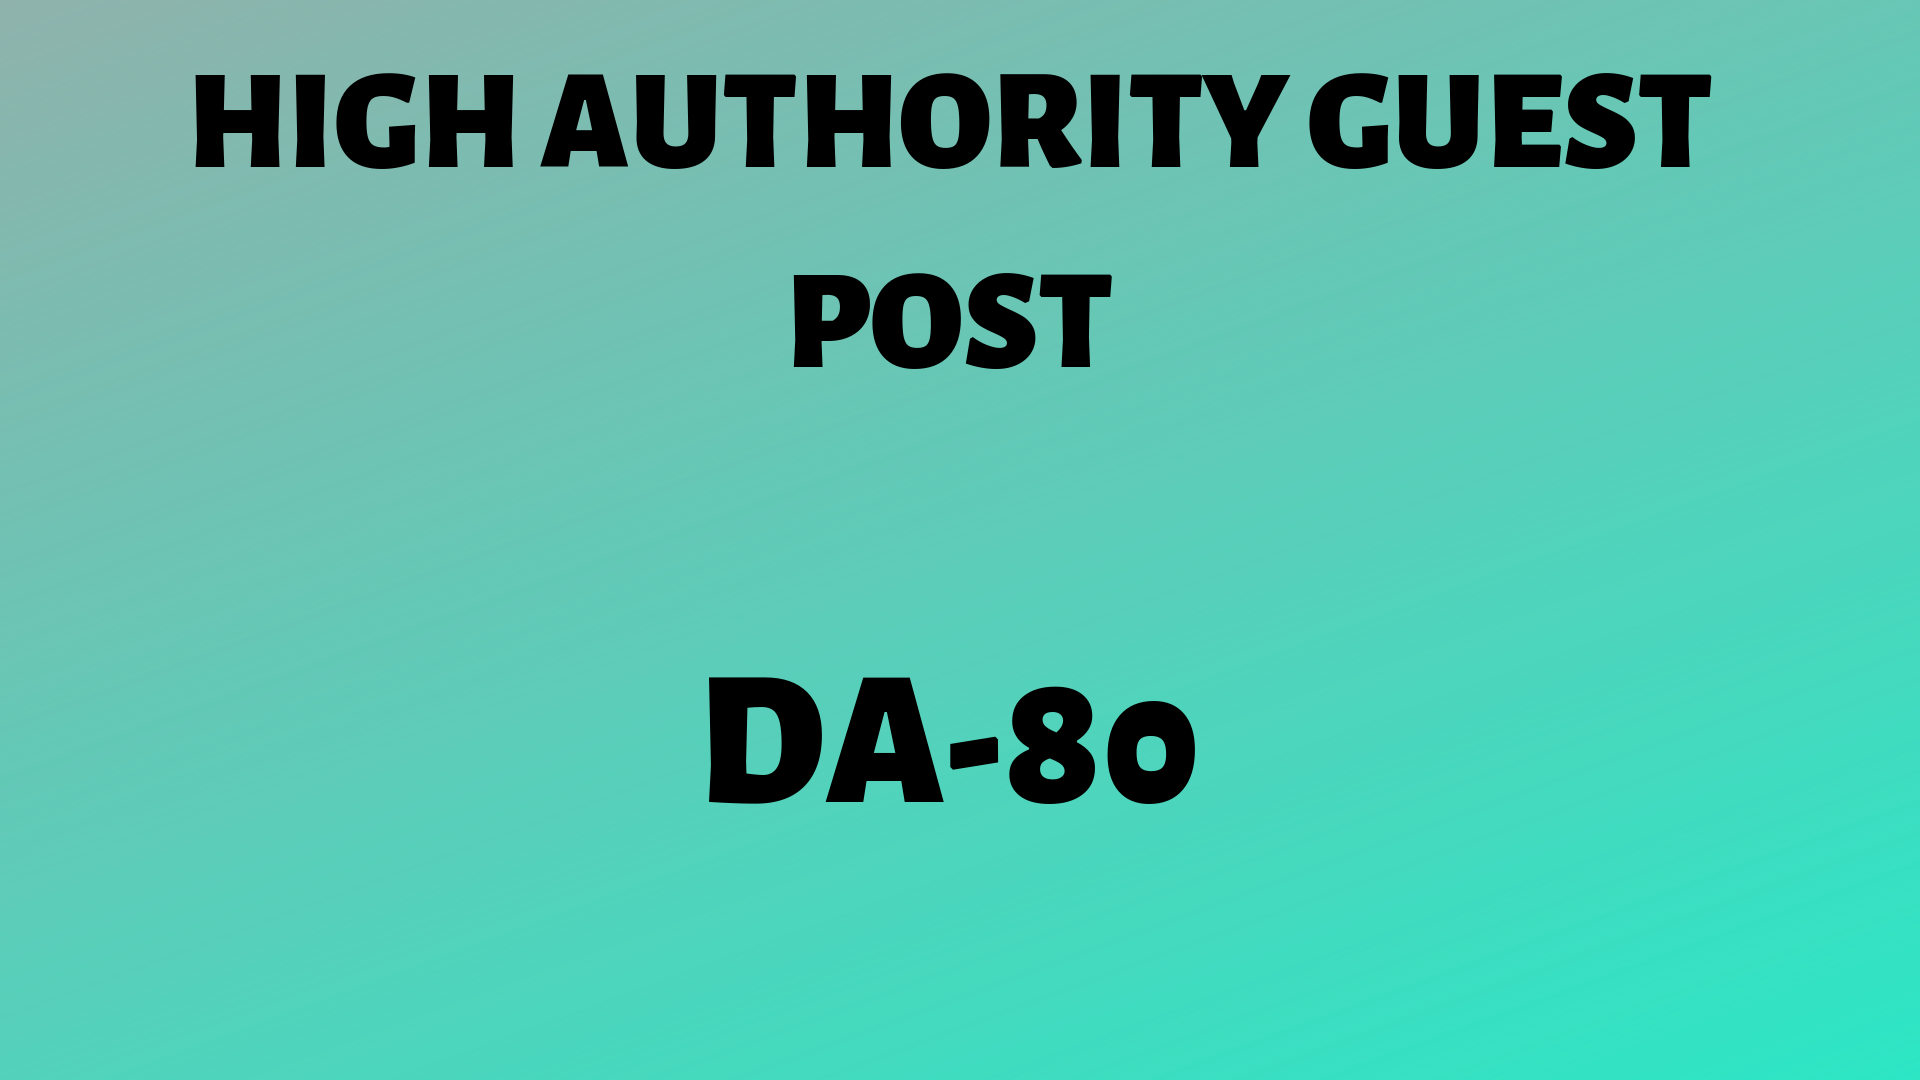 Guestpost on DA-80 website with a backlink.